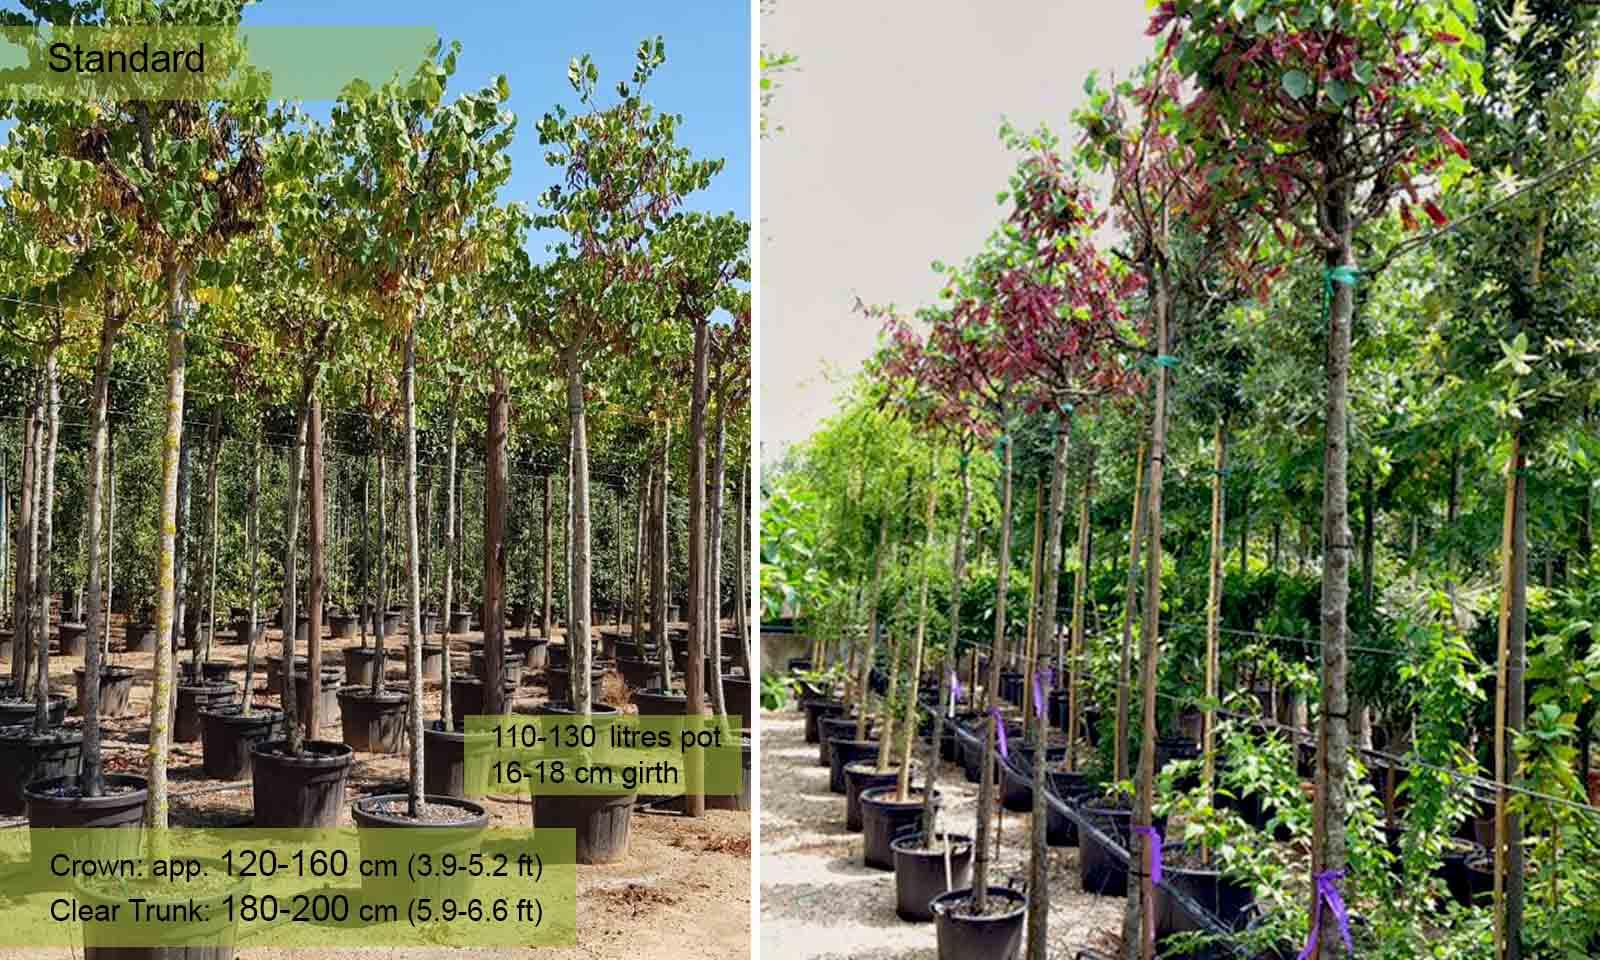 Cercis Siliquastrum (Judas Tree) - Standard